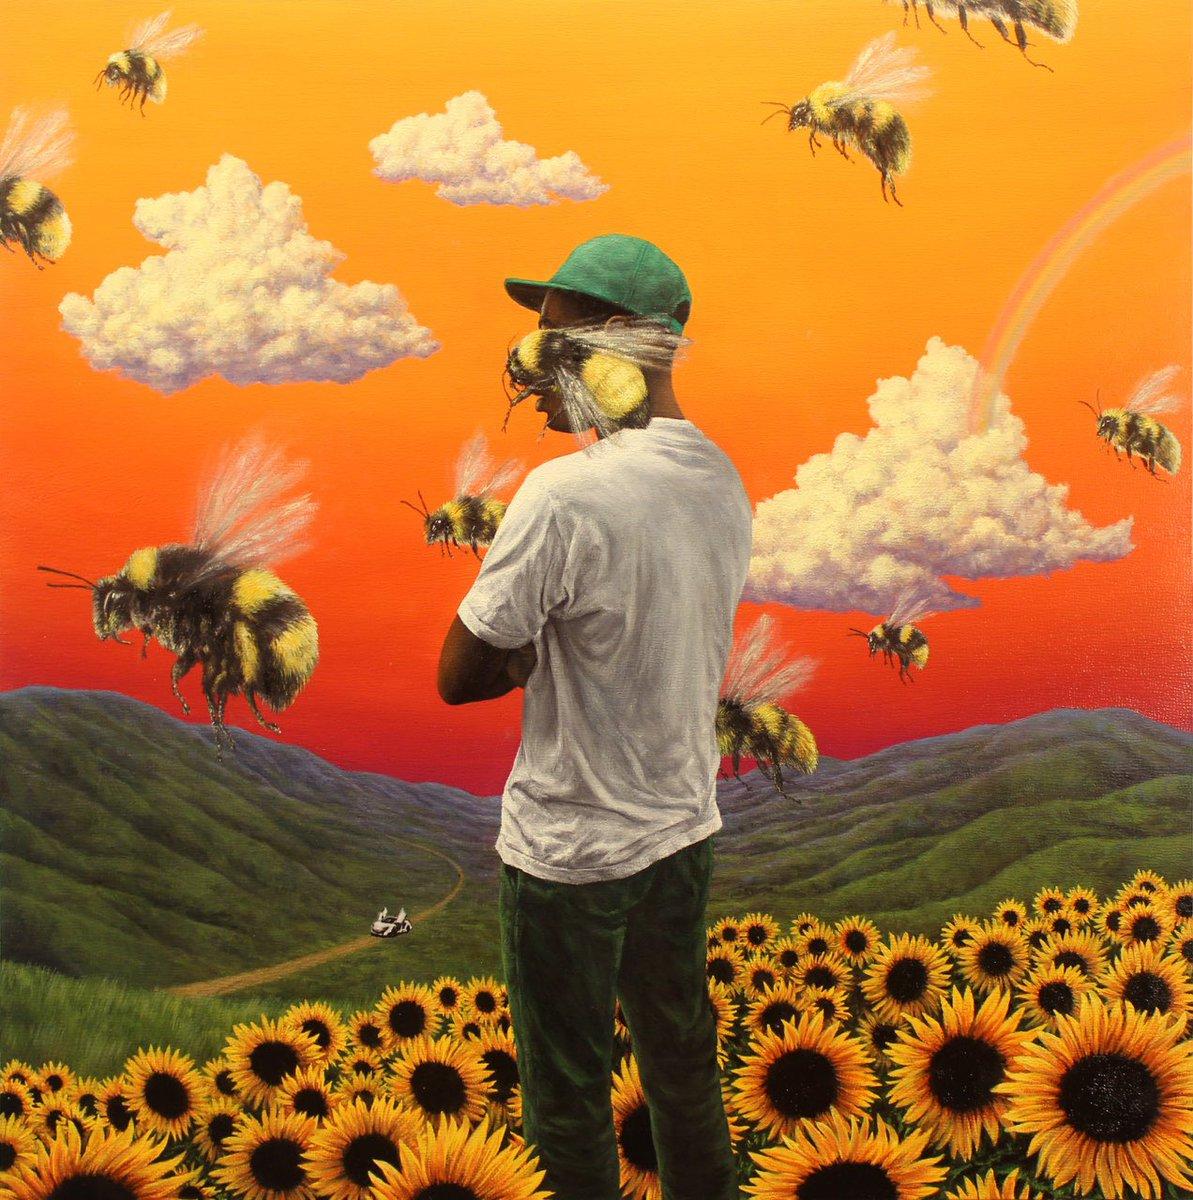 TYLER THE CREATOR - FLOWER BOY (COLUMBIA, 2017)